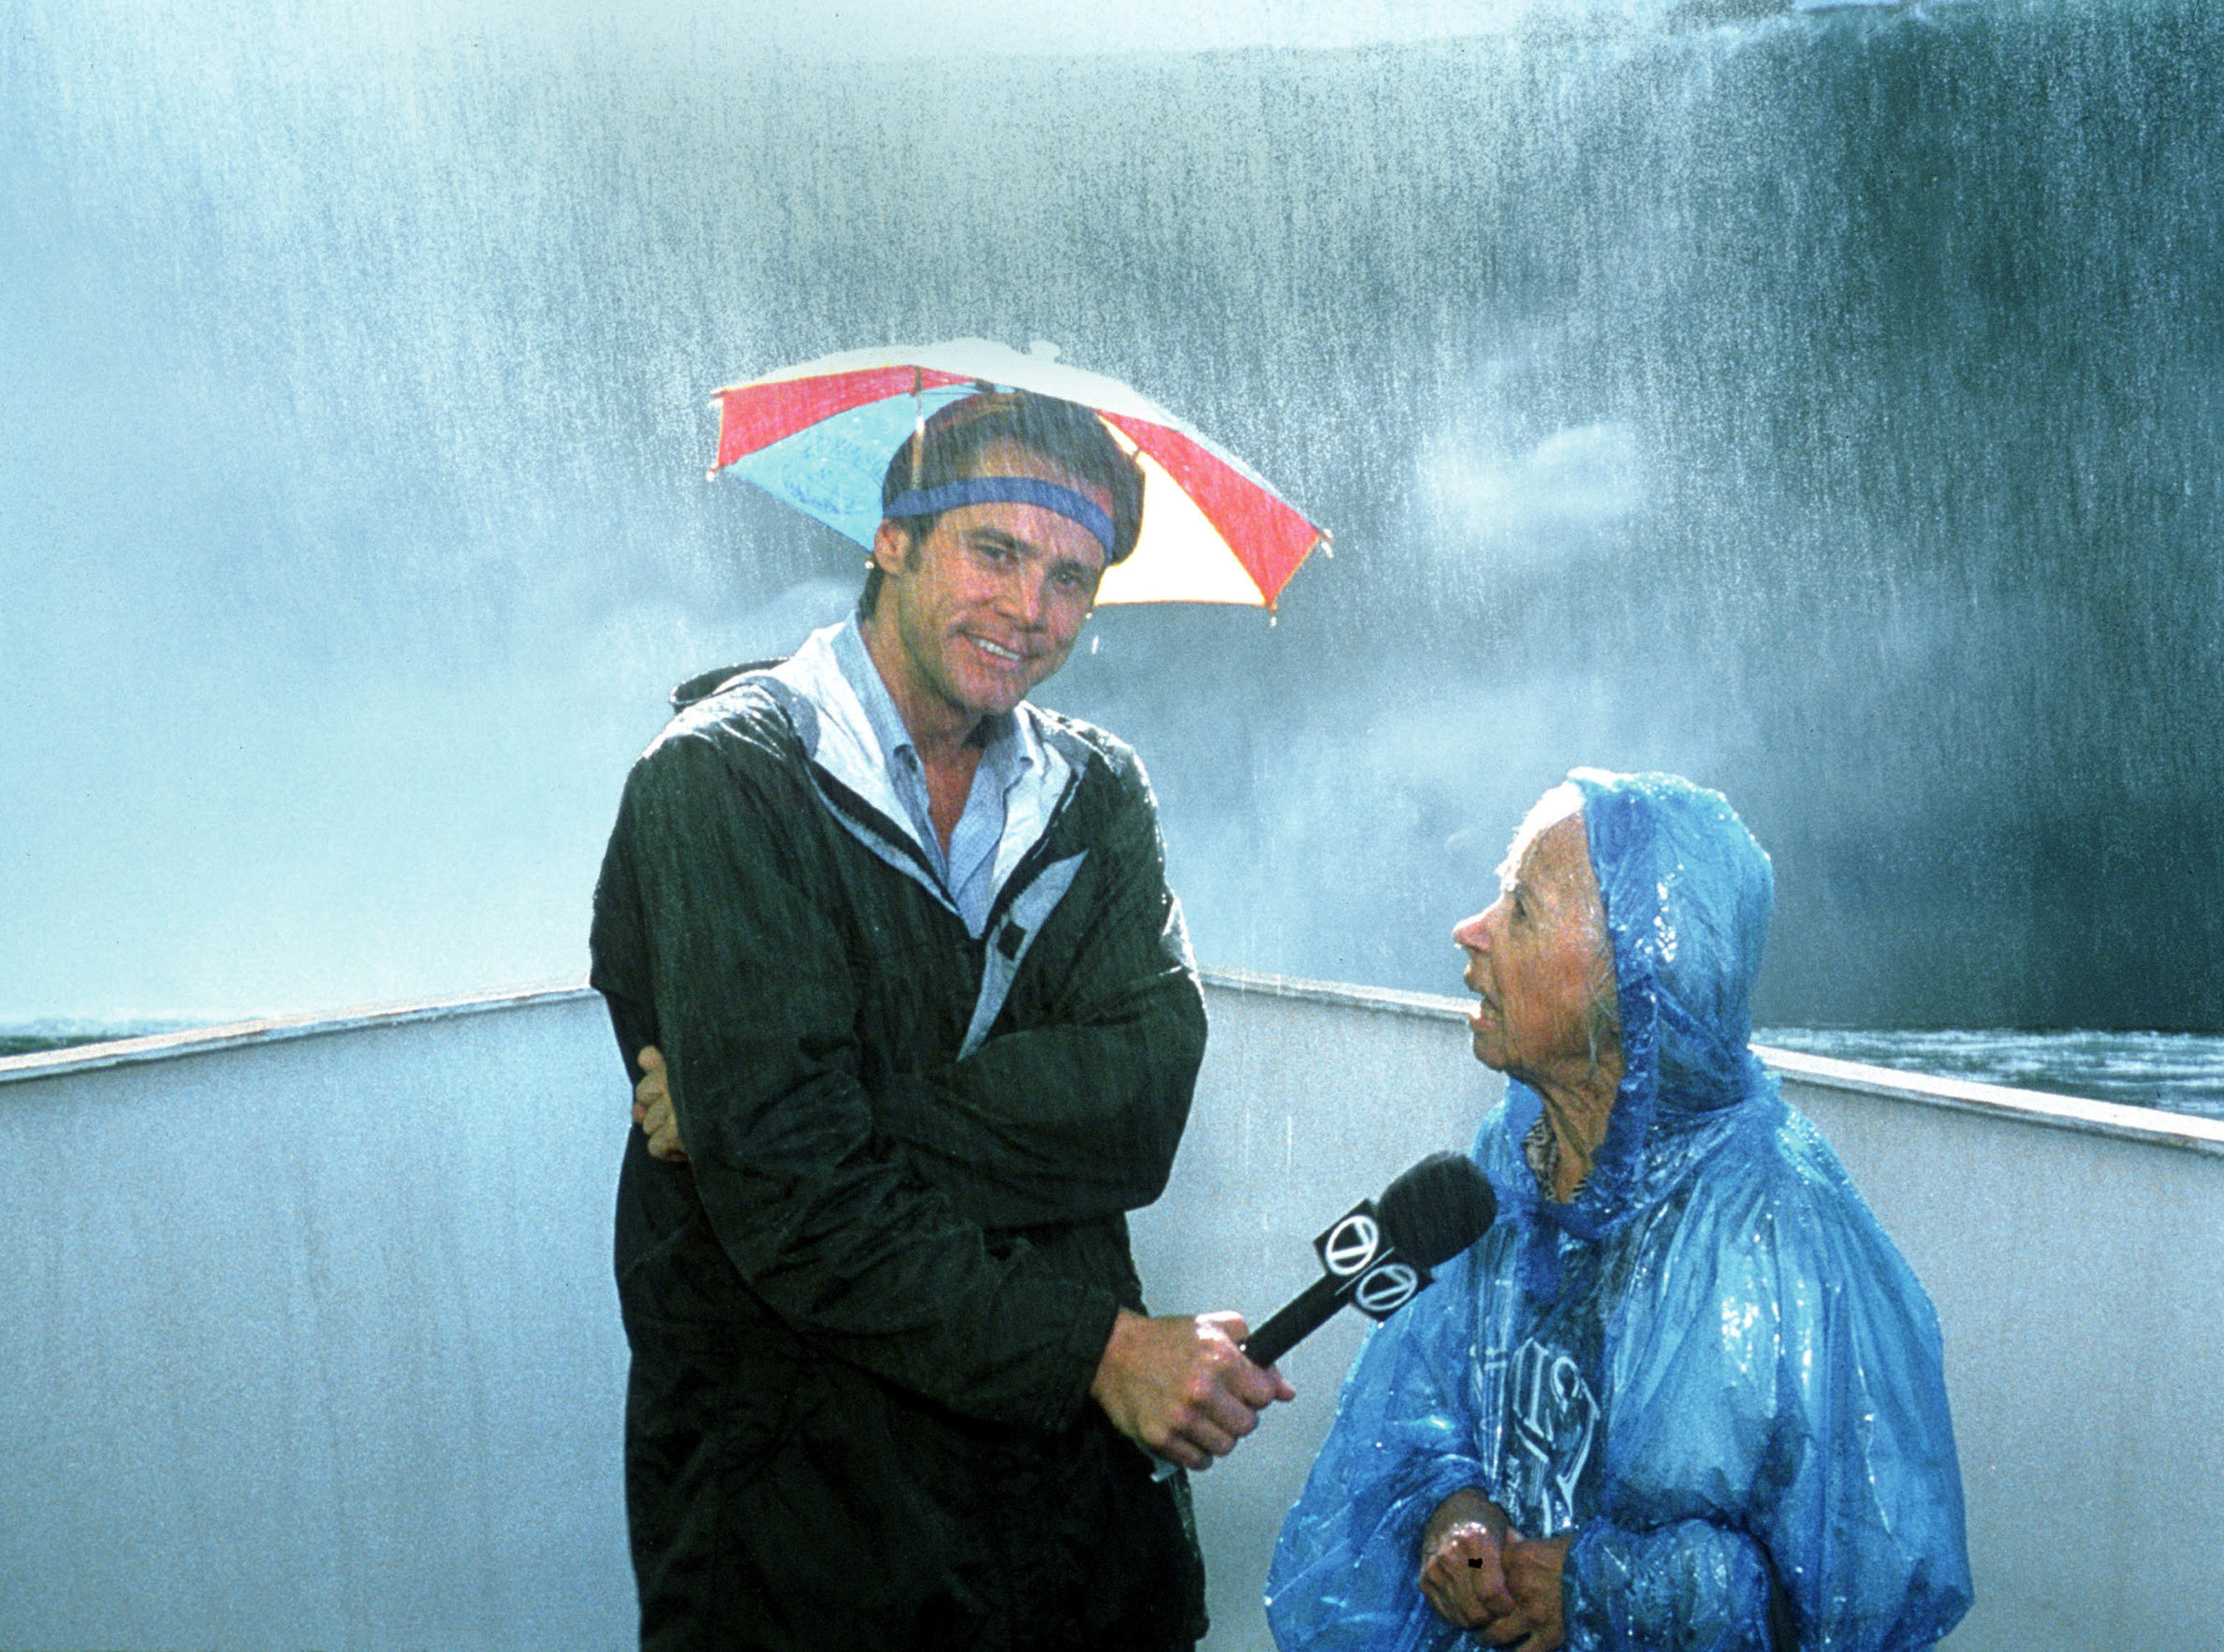 Jim Carrey interviews an older woman next to a waterfall